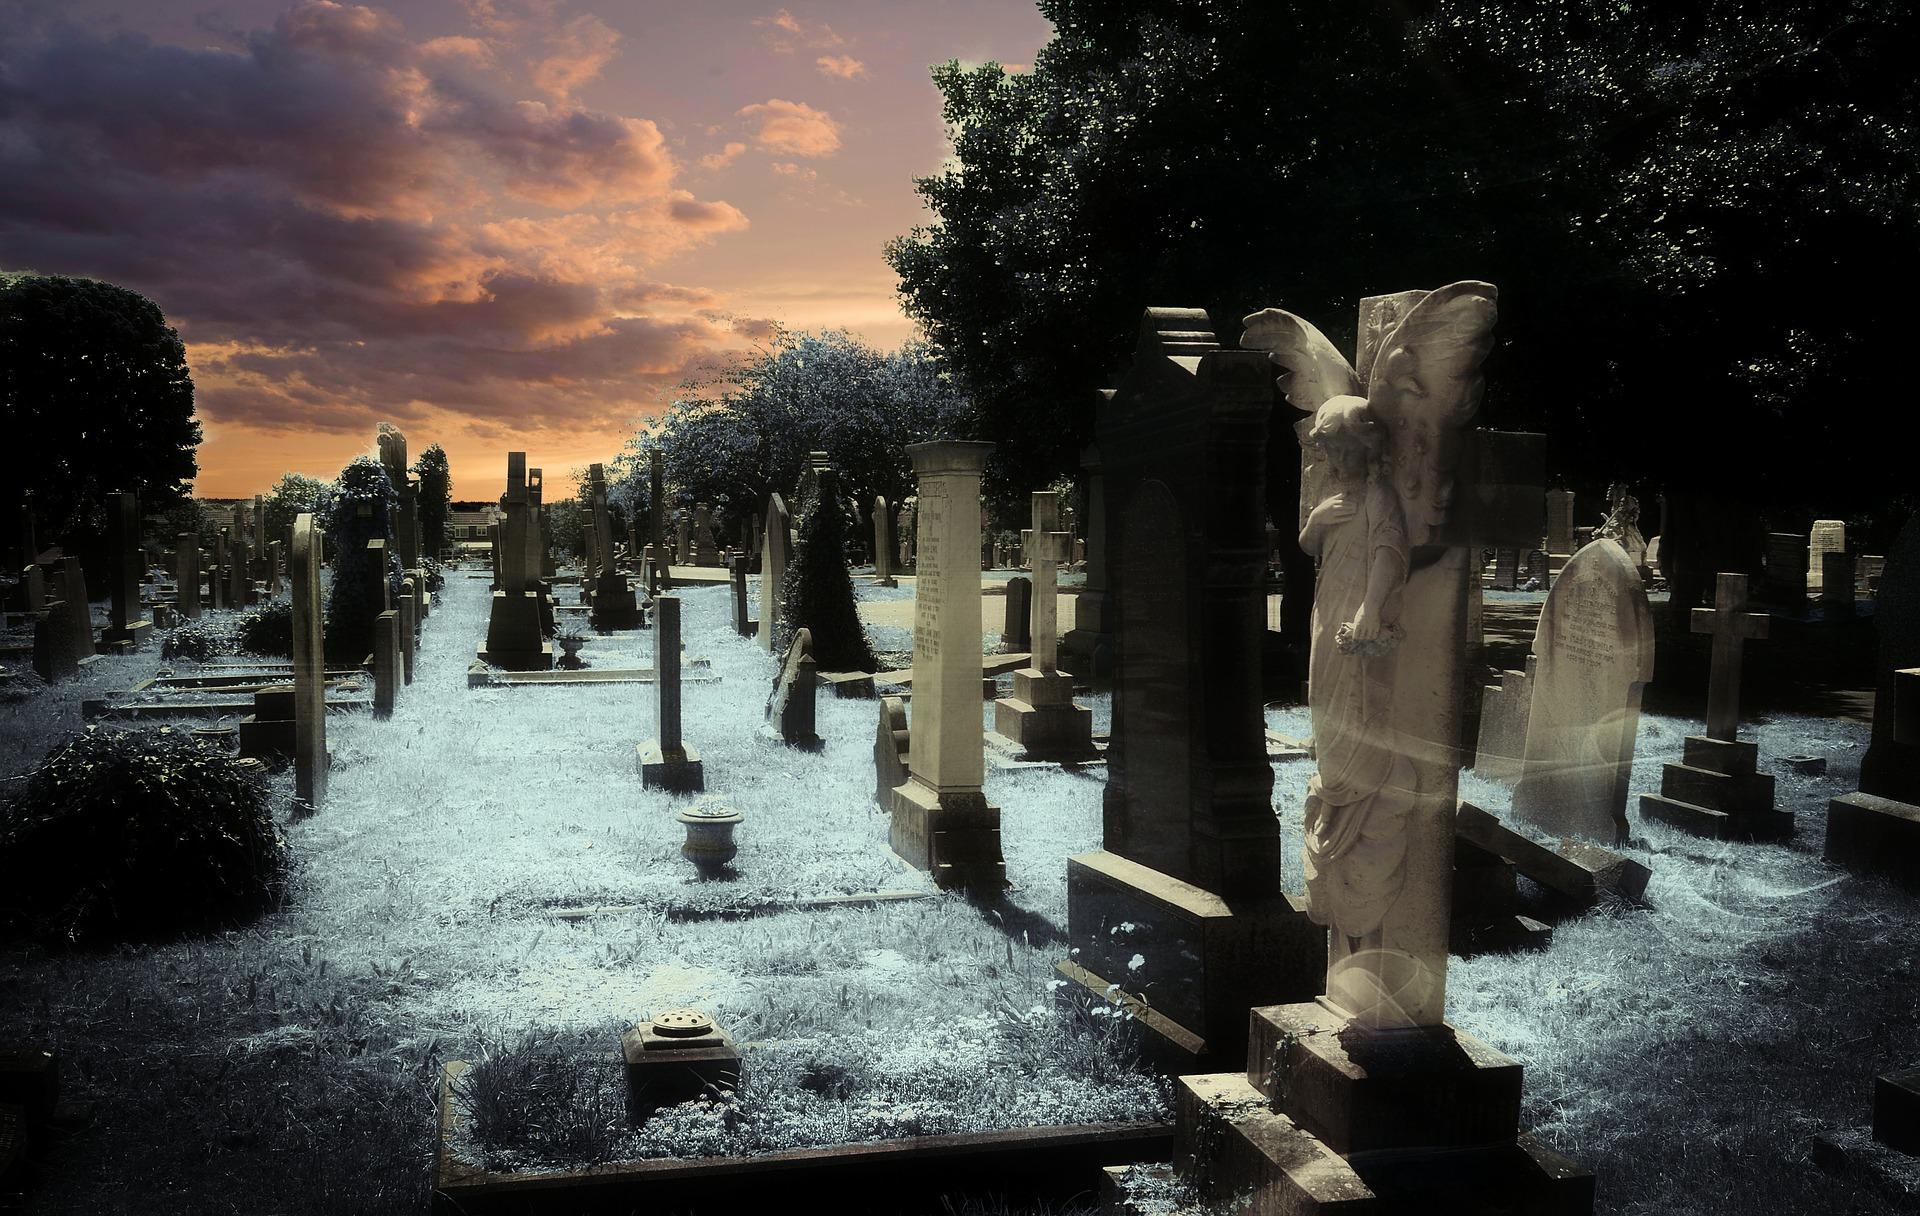 Cmentarz - nagrobki